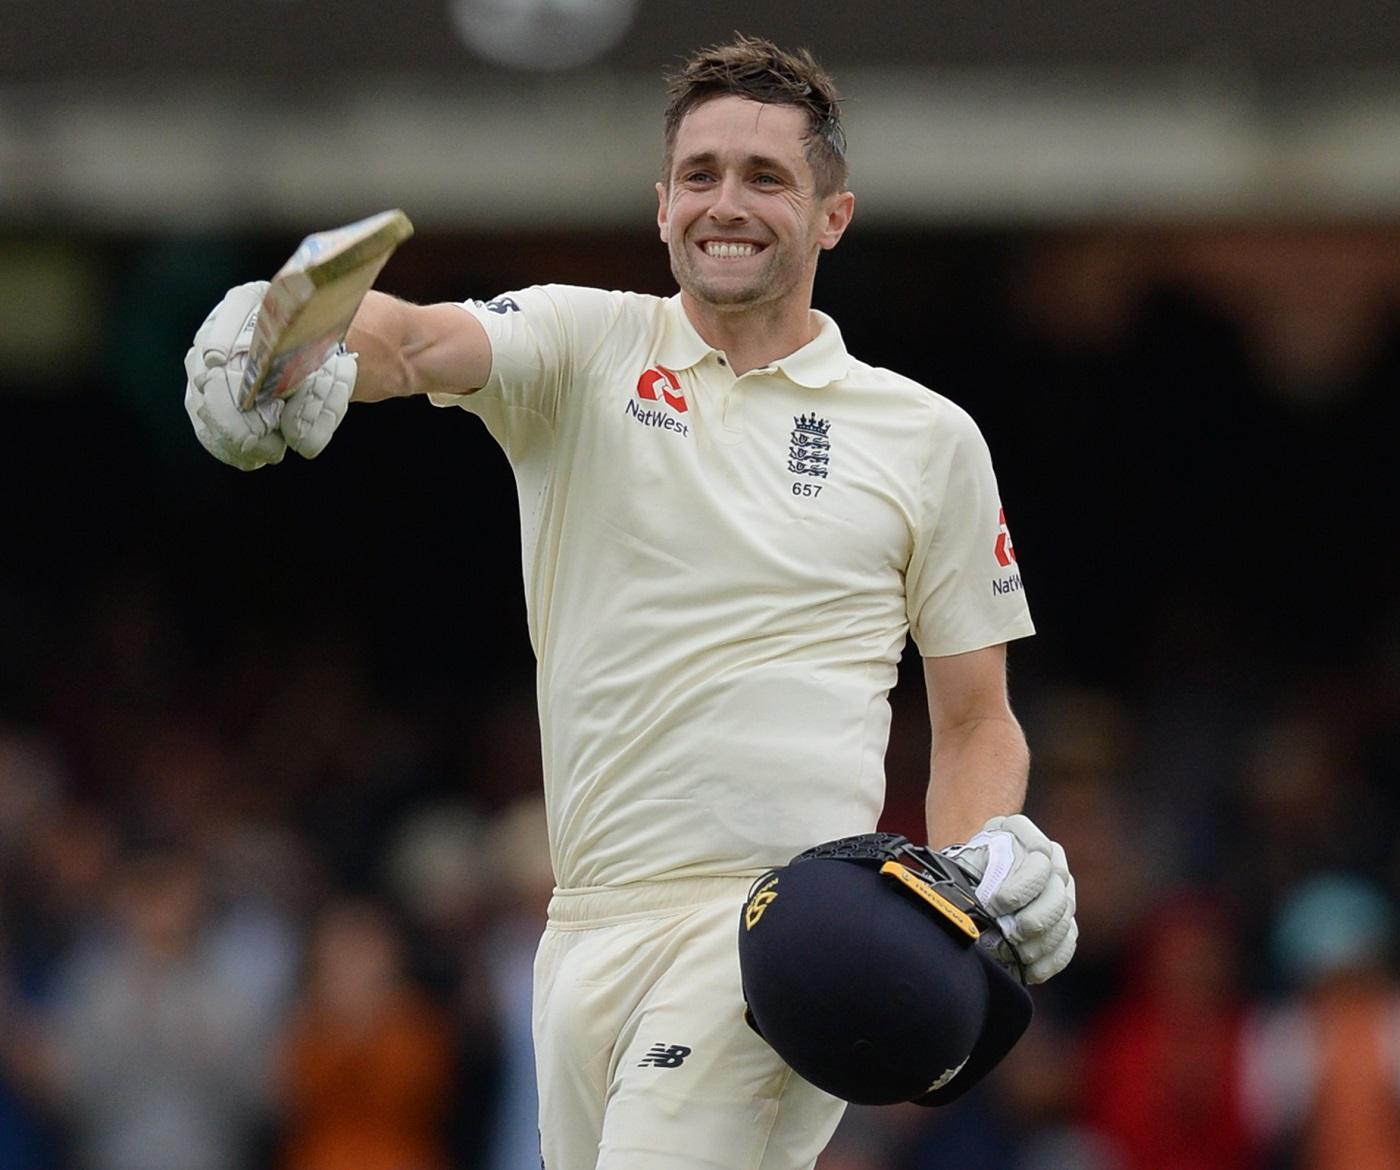 England vs India, Joe Root